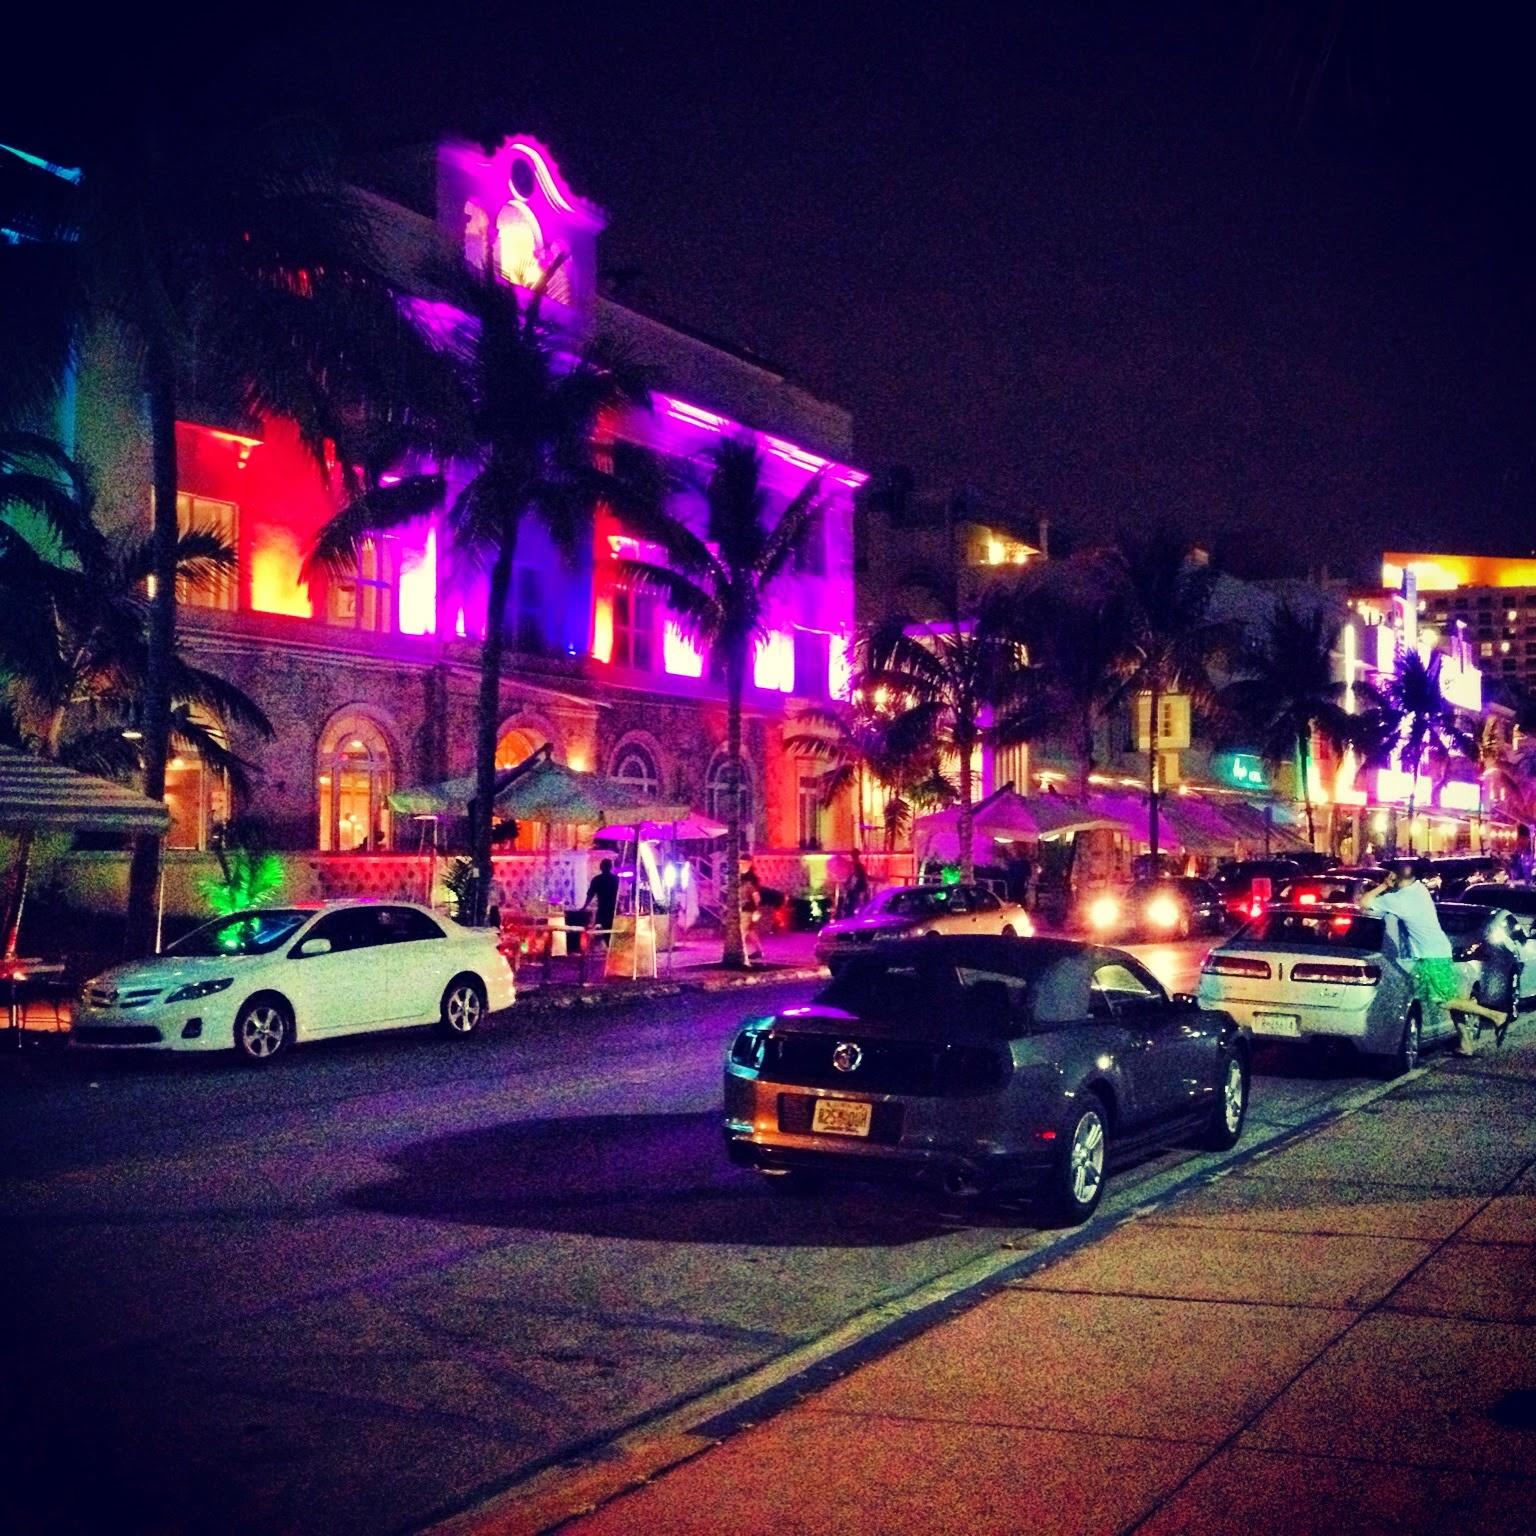 Miami Beach, Polizei, Drogen, Auto, Pizza, Lichter, Miami Beach, Police, Drug, Auto, Pizza, lights